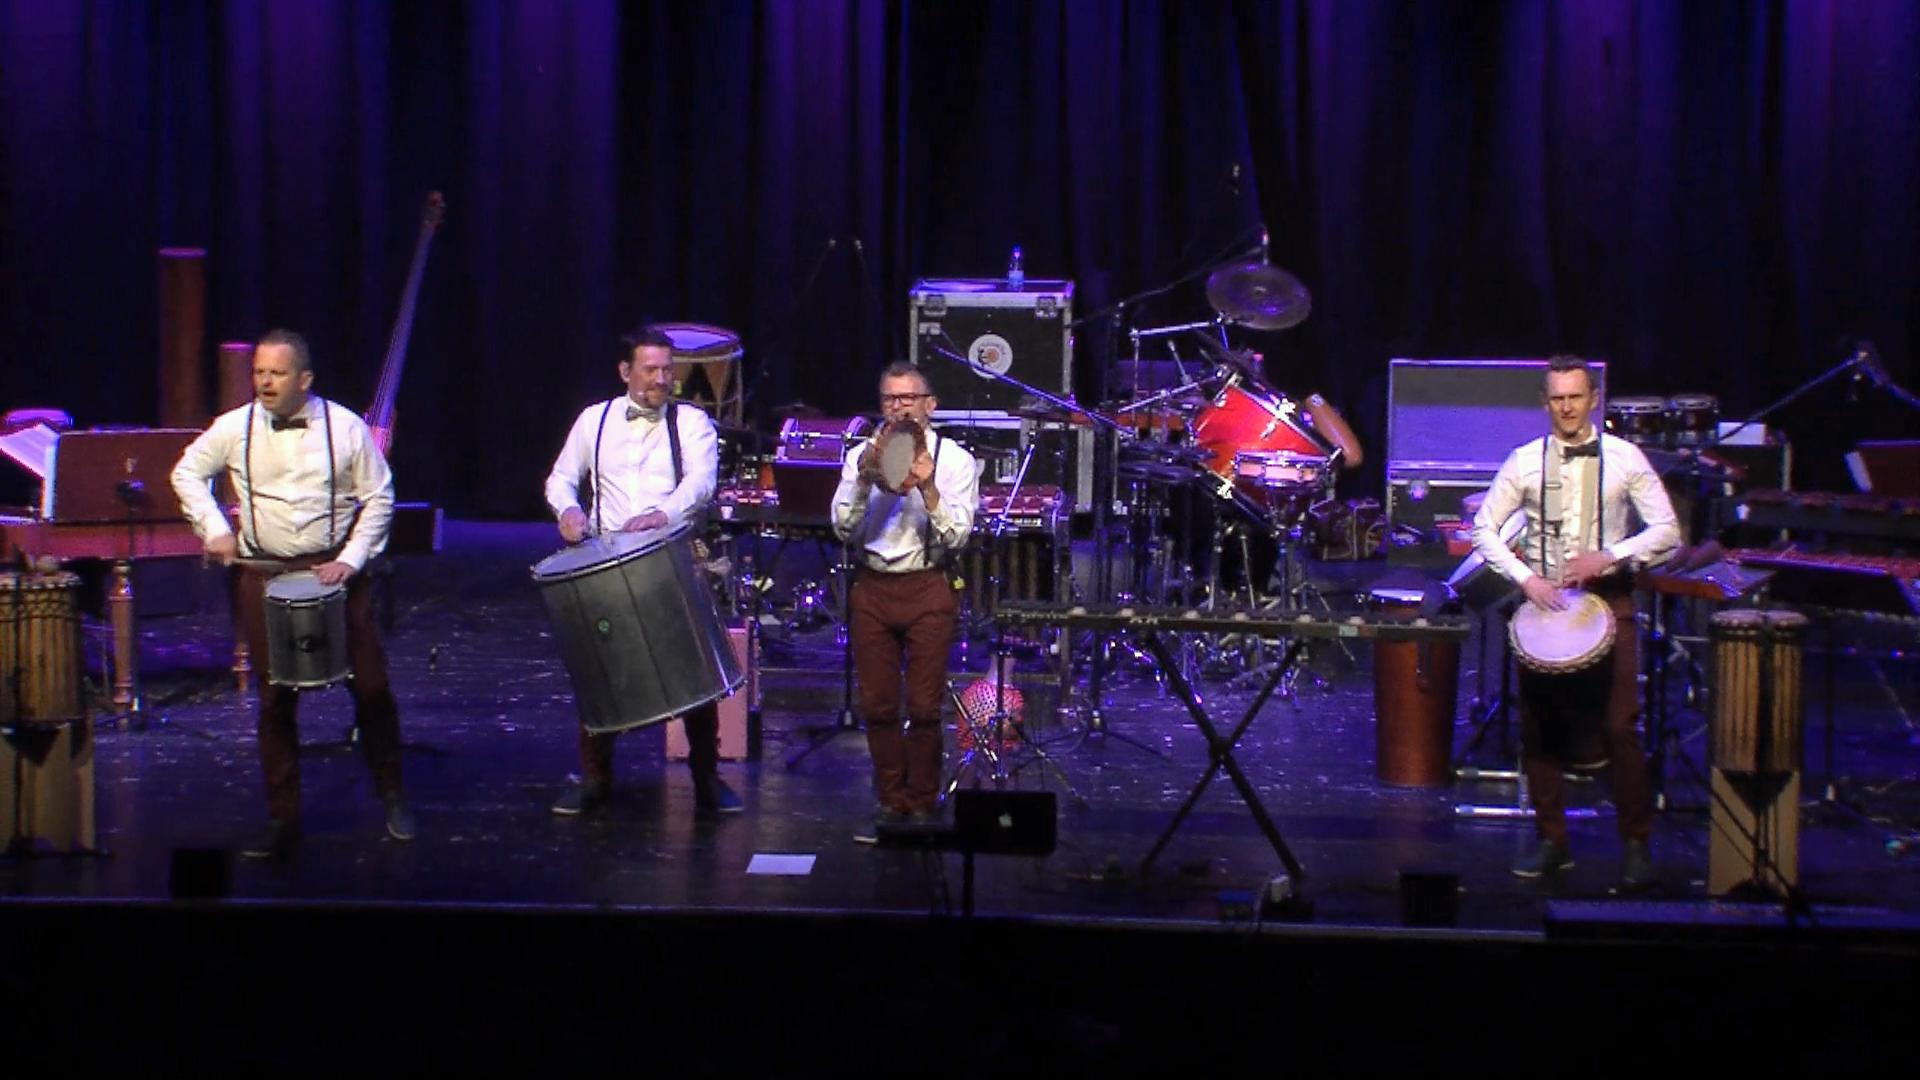 A Talamba együttes veszprémi koncertje